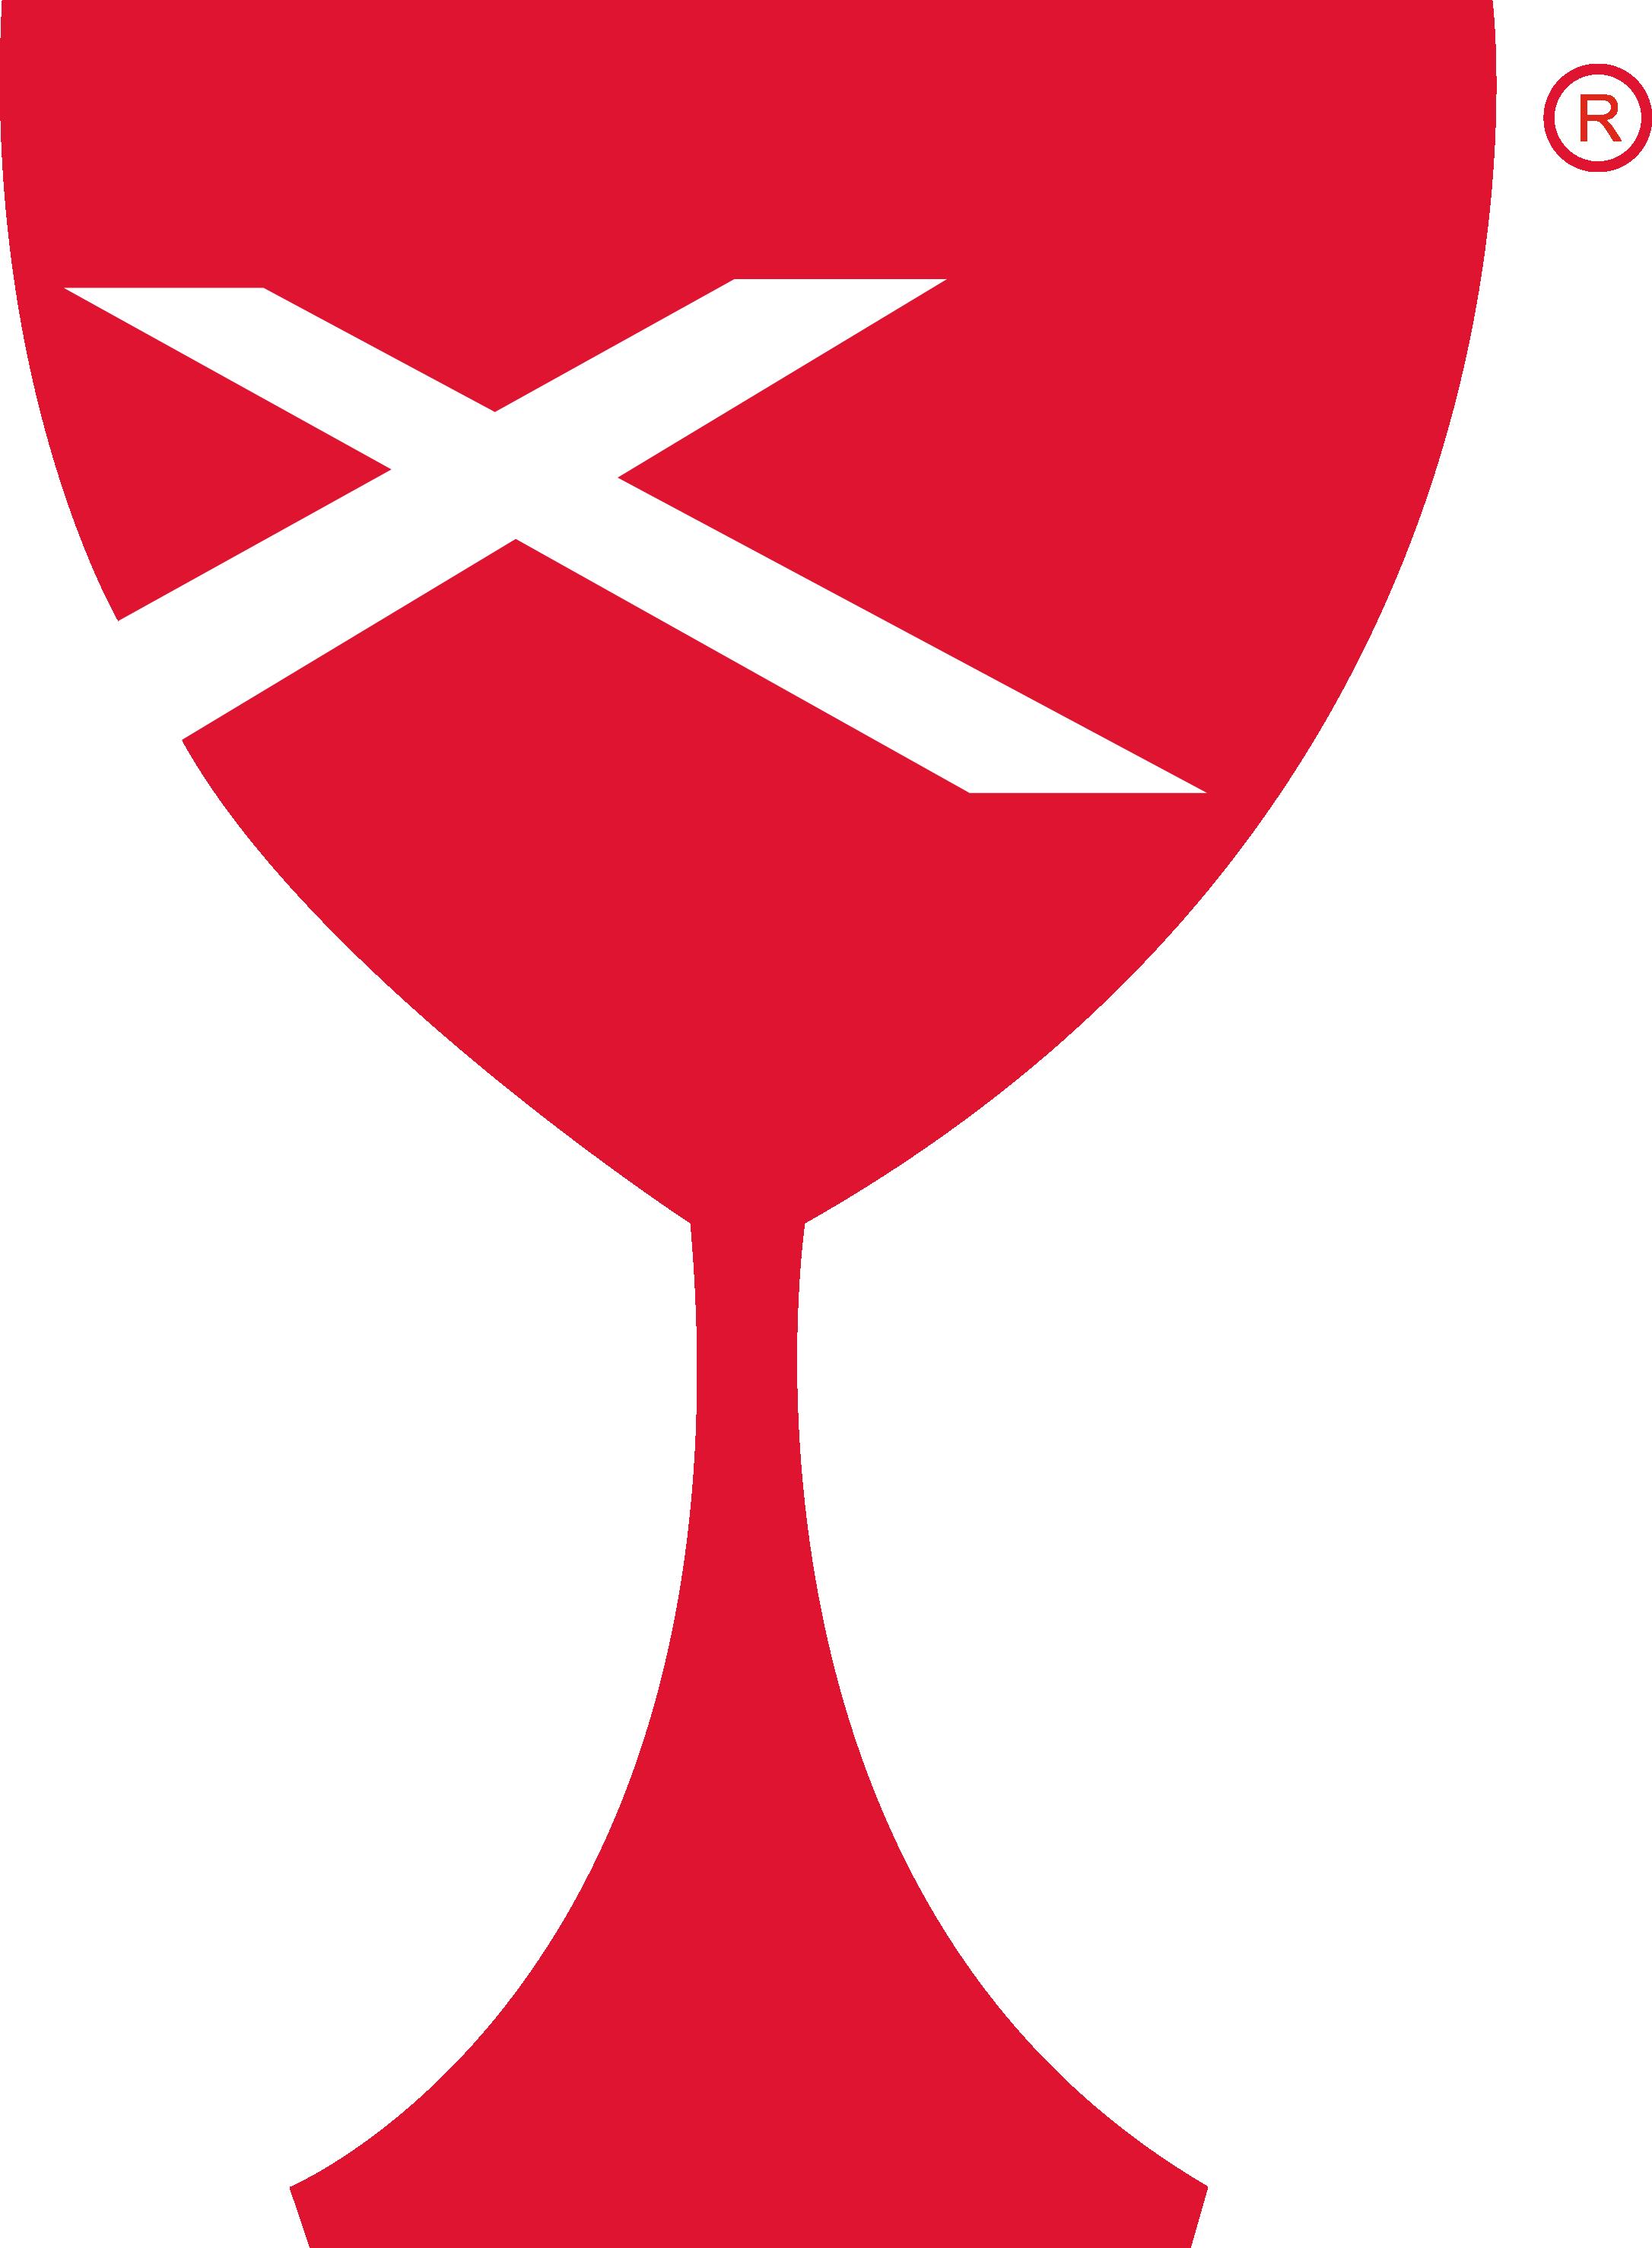 Communion clipart chalice. The logo